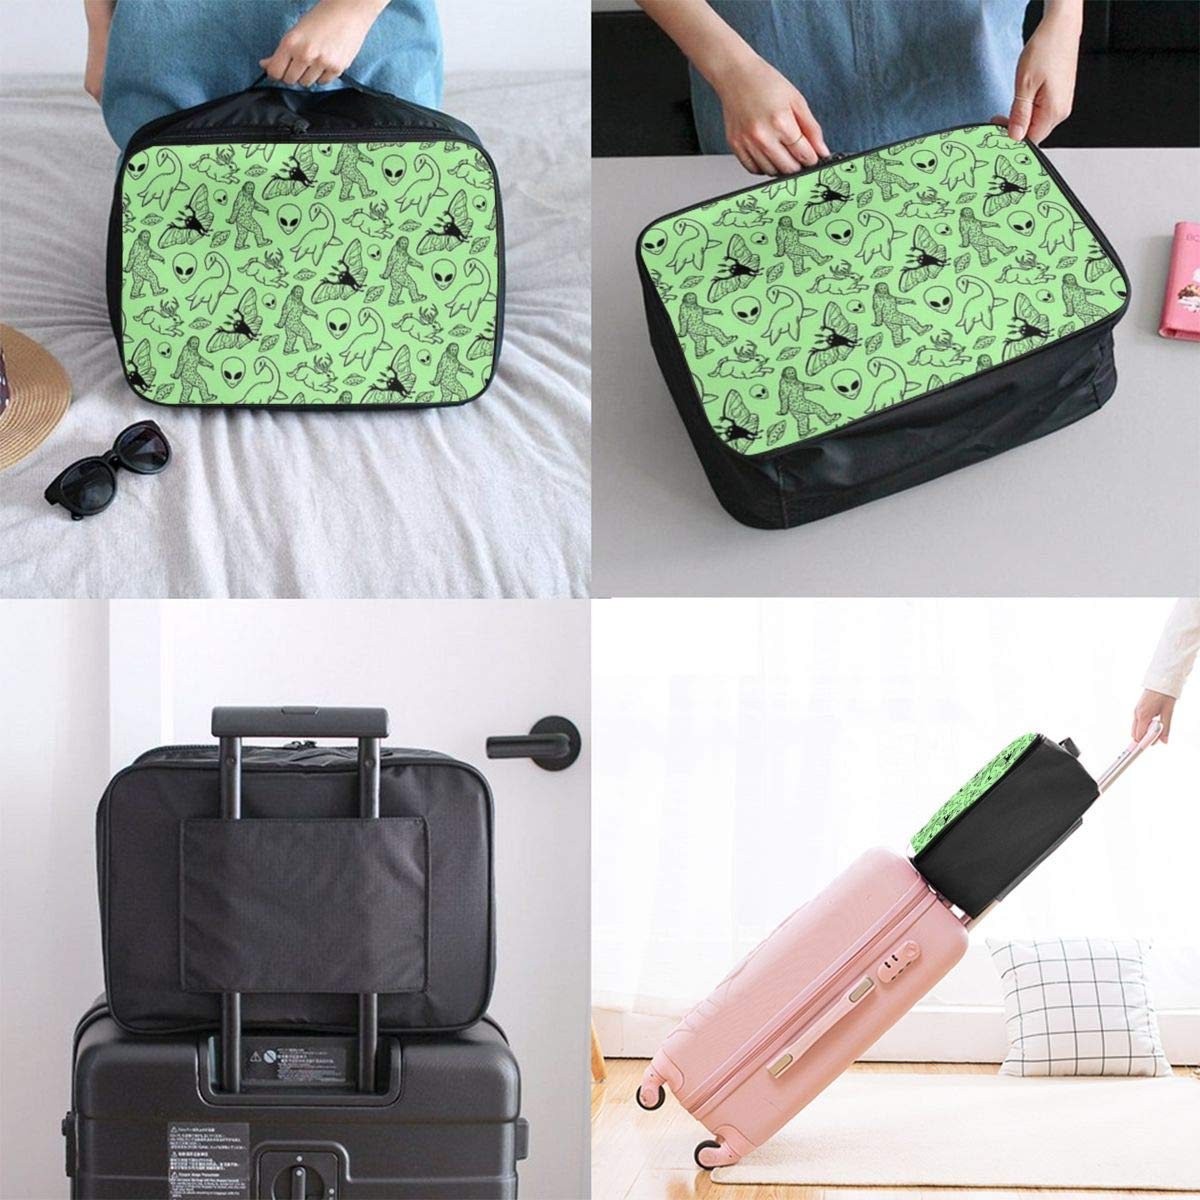 Luggage Lever Bags For Travel Lightweight Large Capacity Portable Duffel Bag For Men /& Women Travel Luggage Duffel Bag Funny Bikini Corgi Dog Mermaid